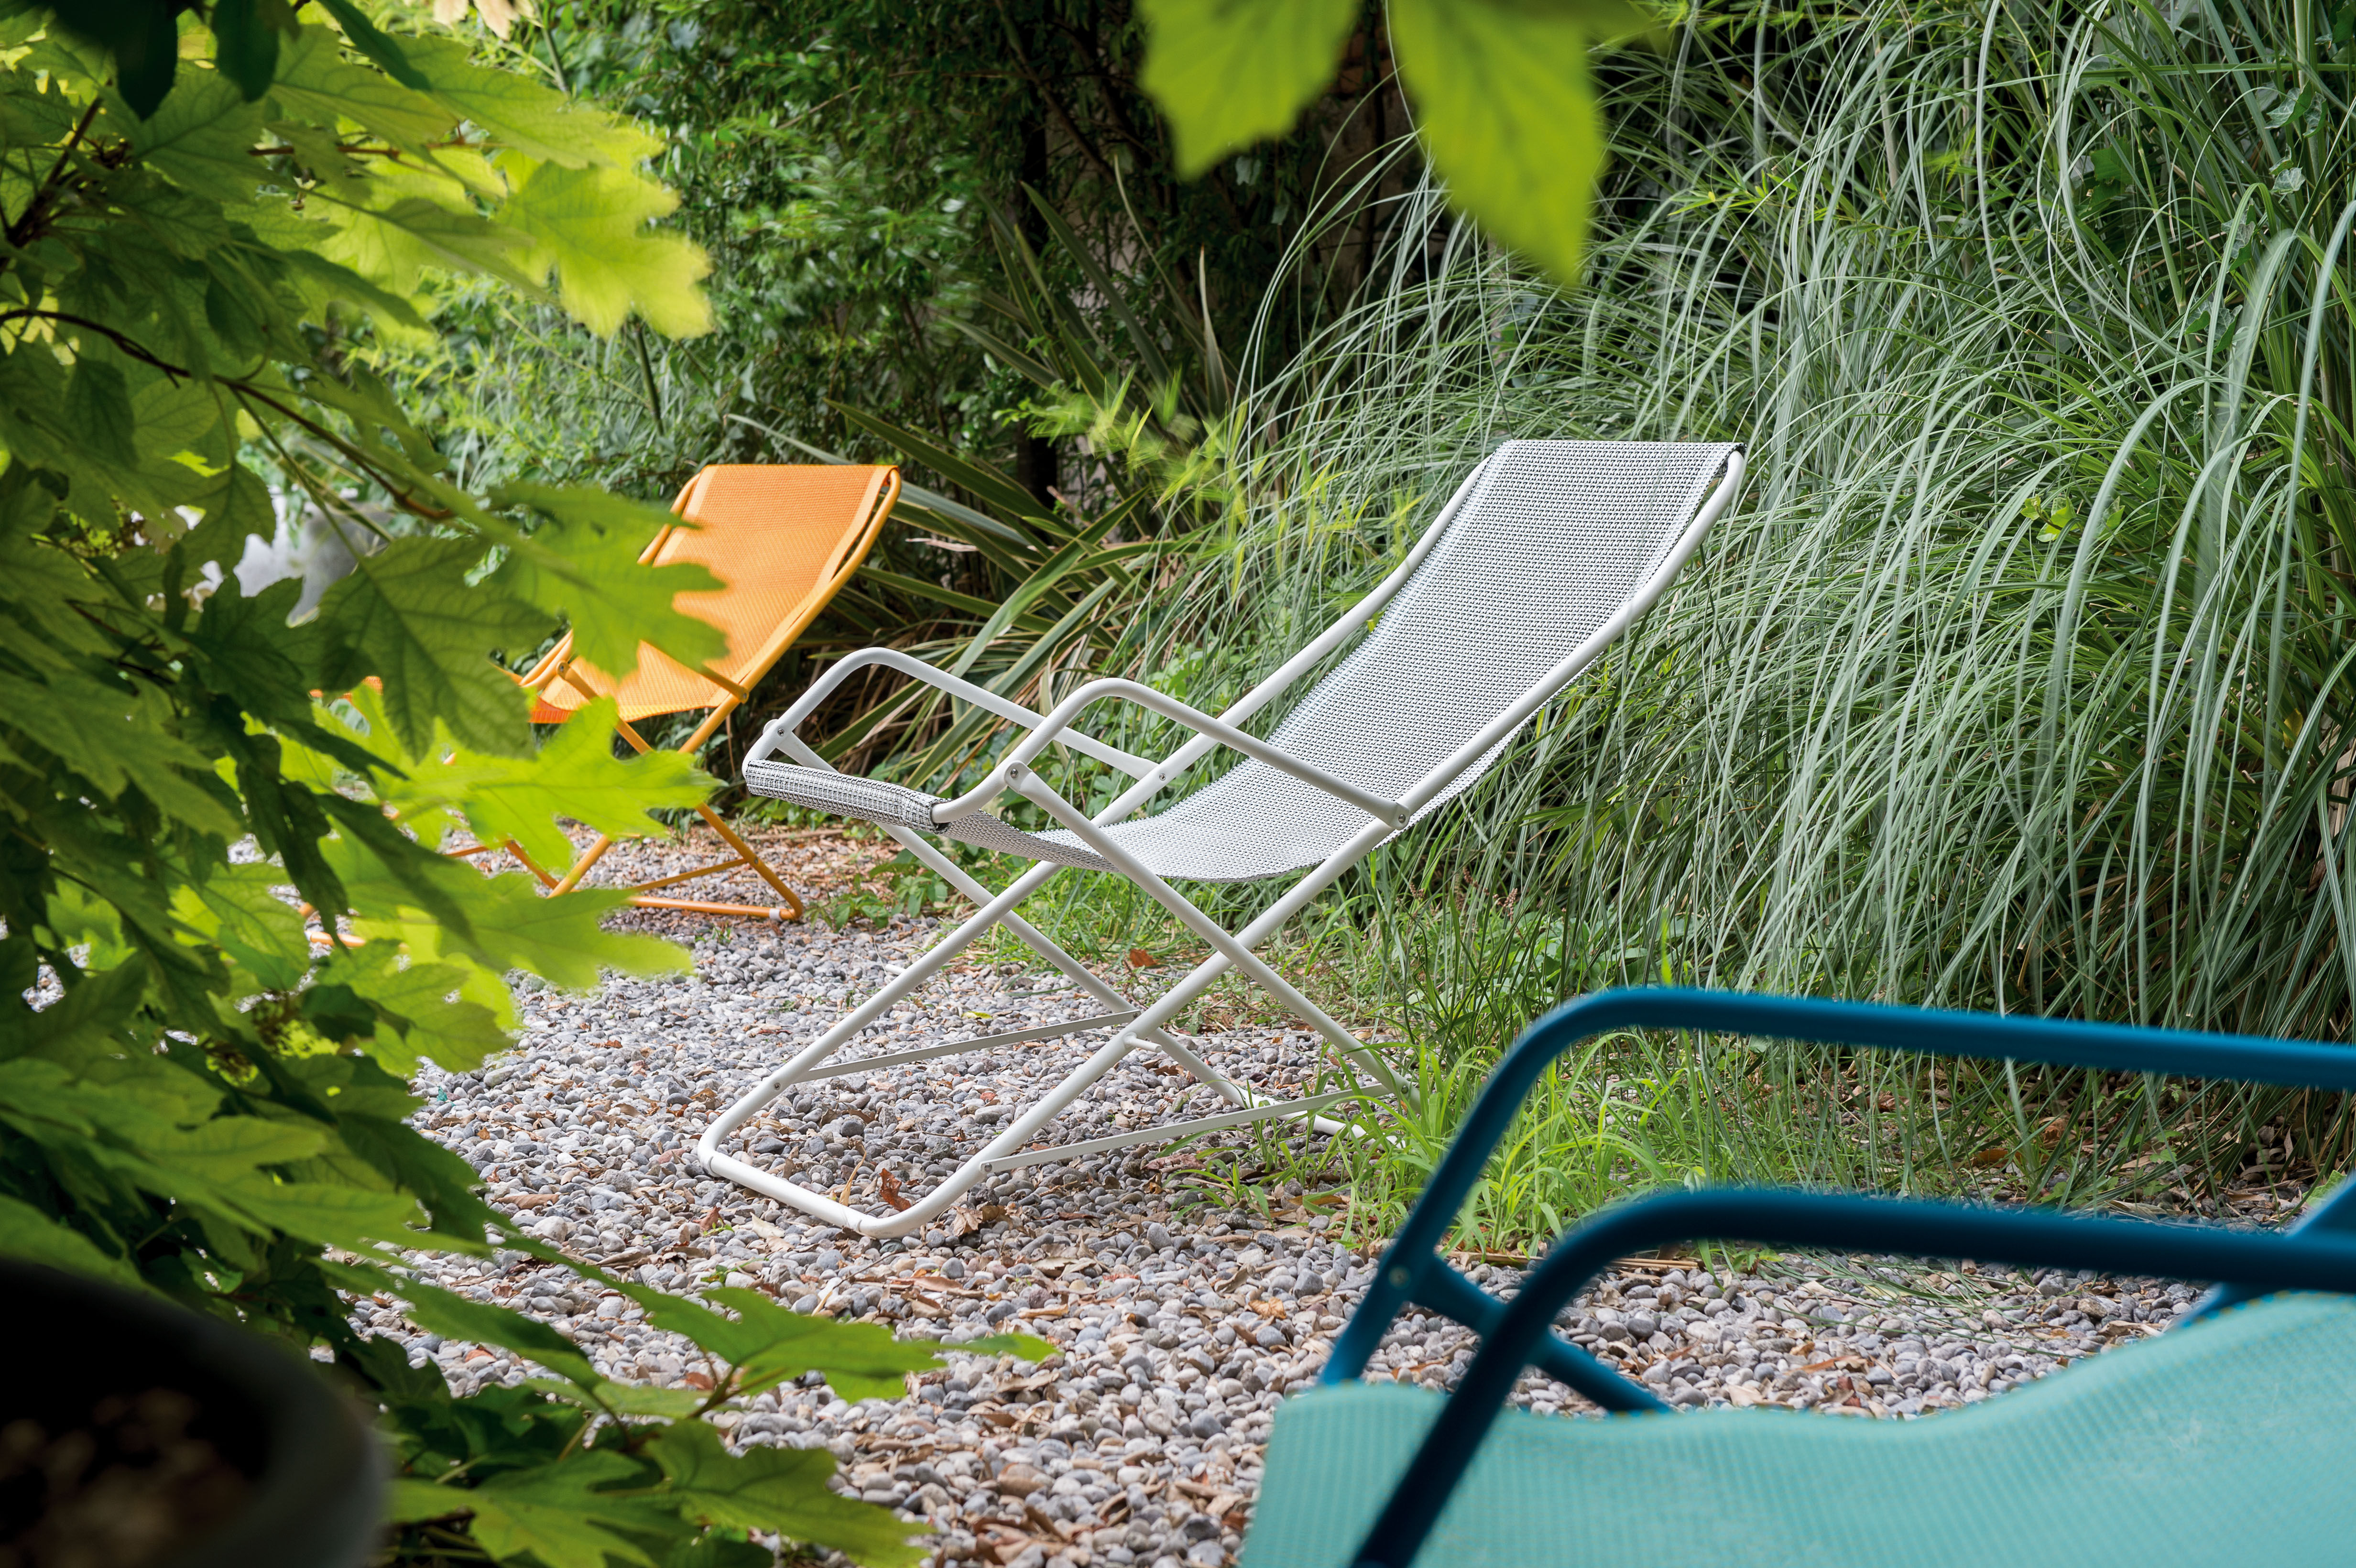 Emu Sdraio Bahama Prezzo.Chaise Longue Bahama Emu Tela Rosso Struttura Rosso L 58 X H